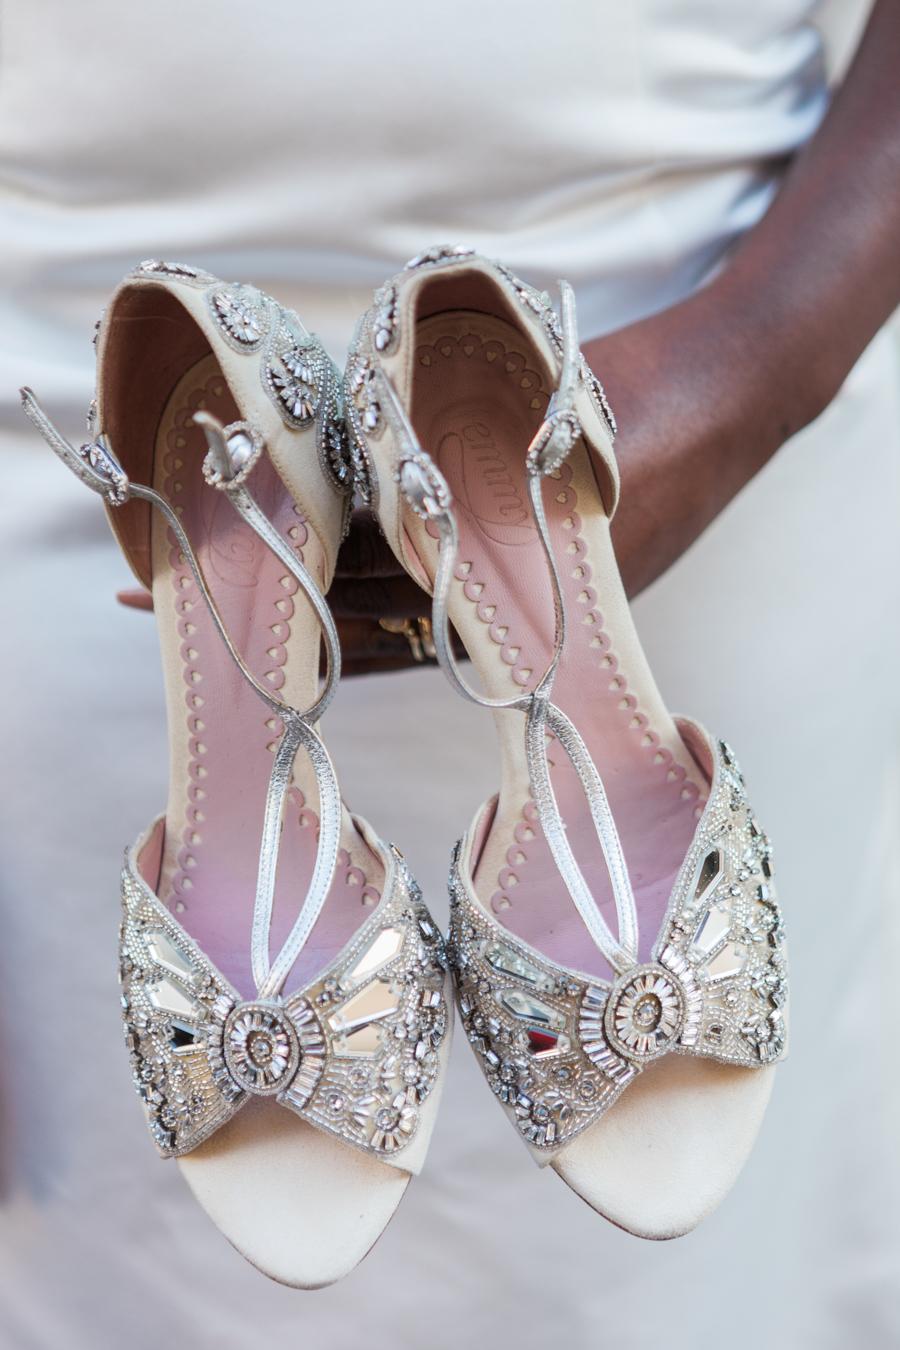 Breathtakingly beautiful - diversity wins in this stunning RSA London wedding editorial! (1)